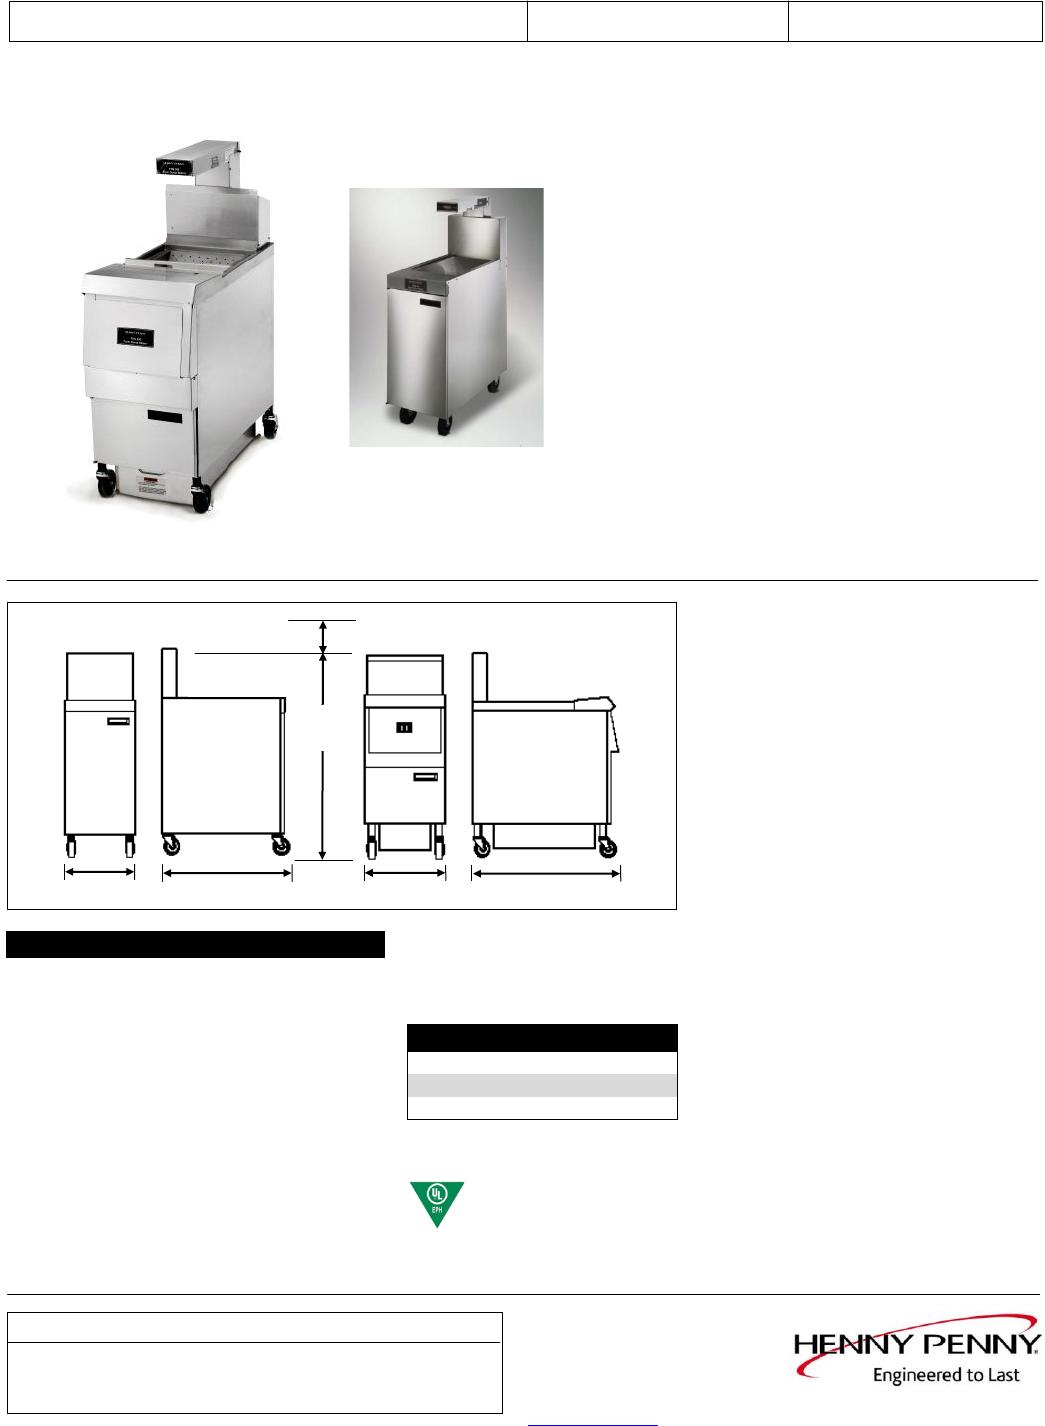 FDS 100 200 Dump Station Data Sheet